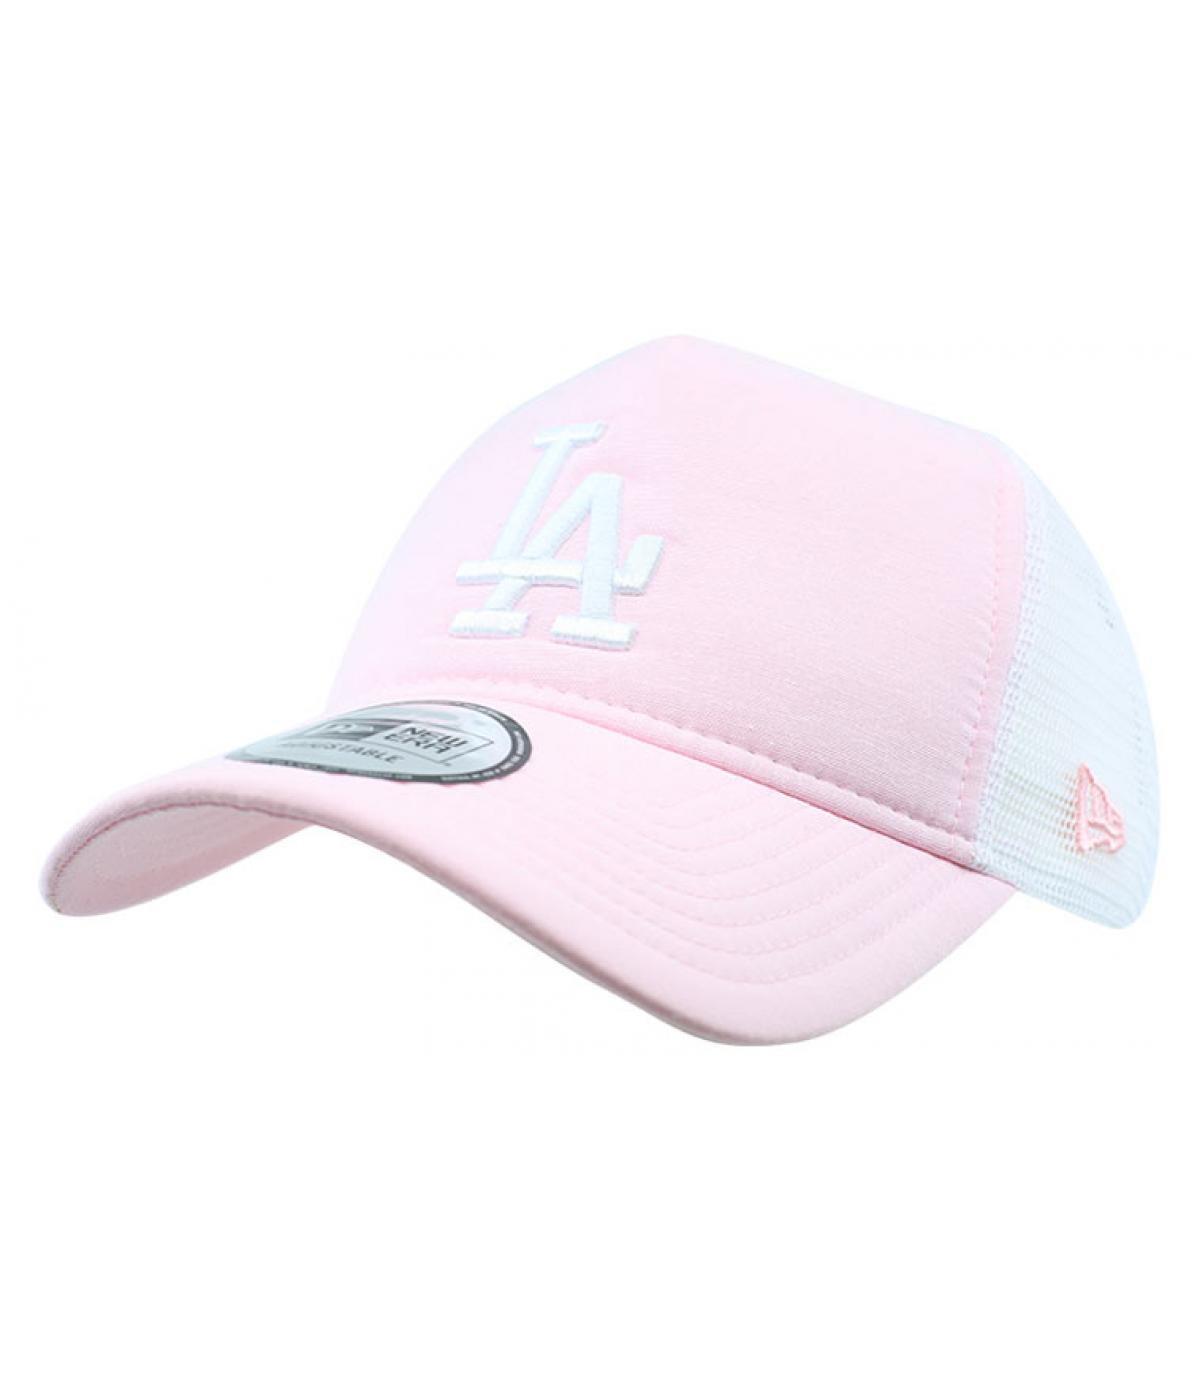 Details Trucker MLB Oxford LA pink - Abbildung 2